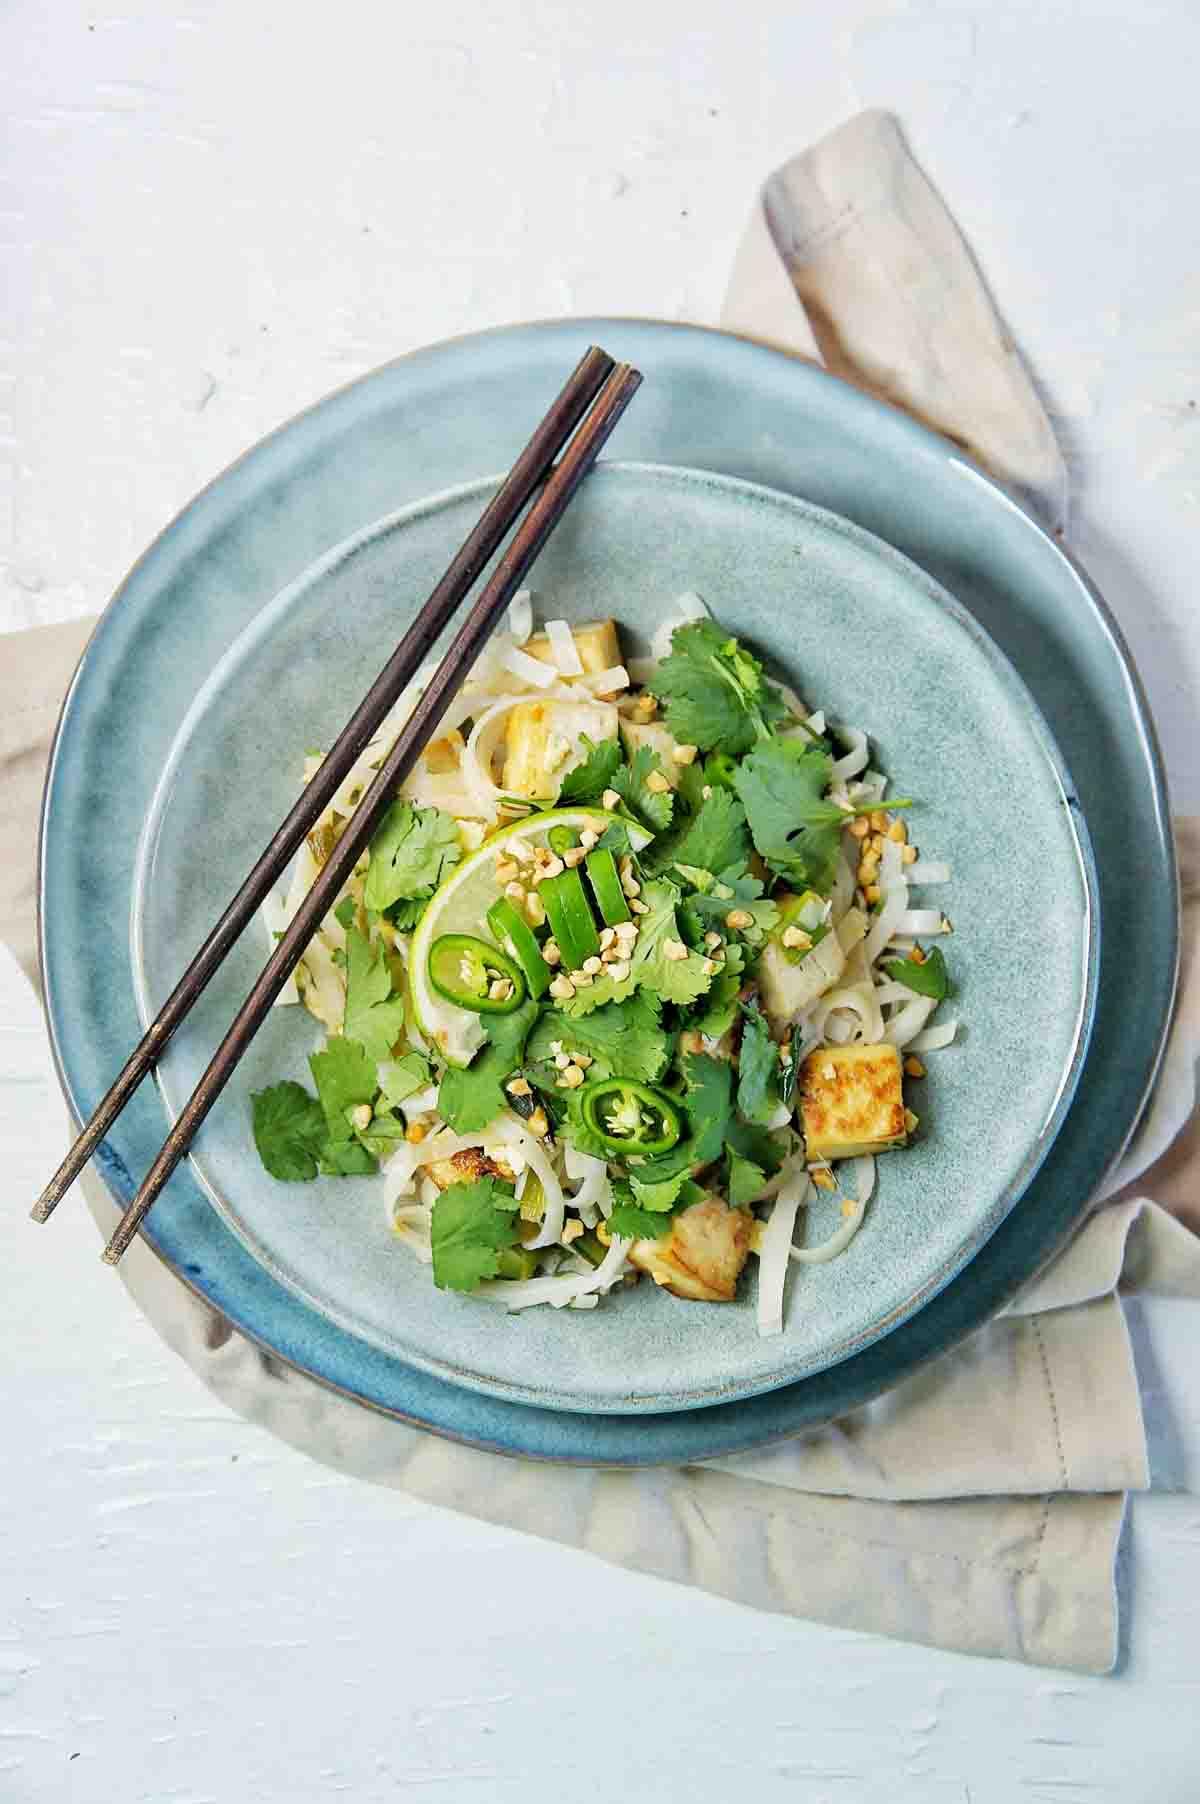 Tofu Pad Thai in a blue bowl with chopsticks